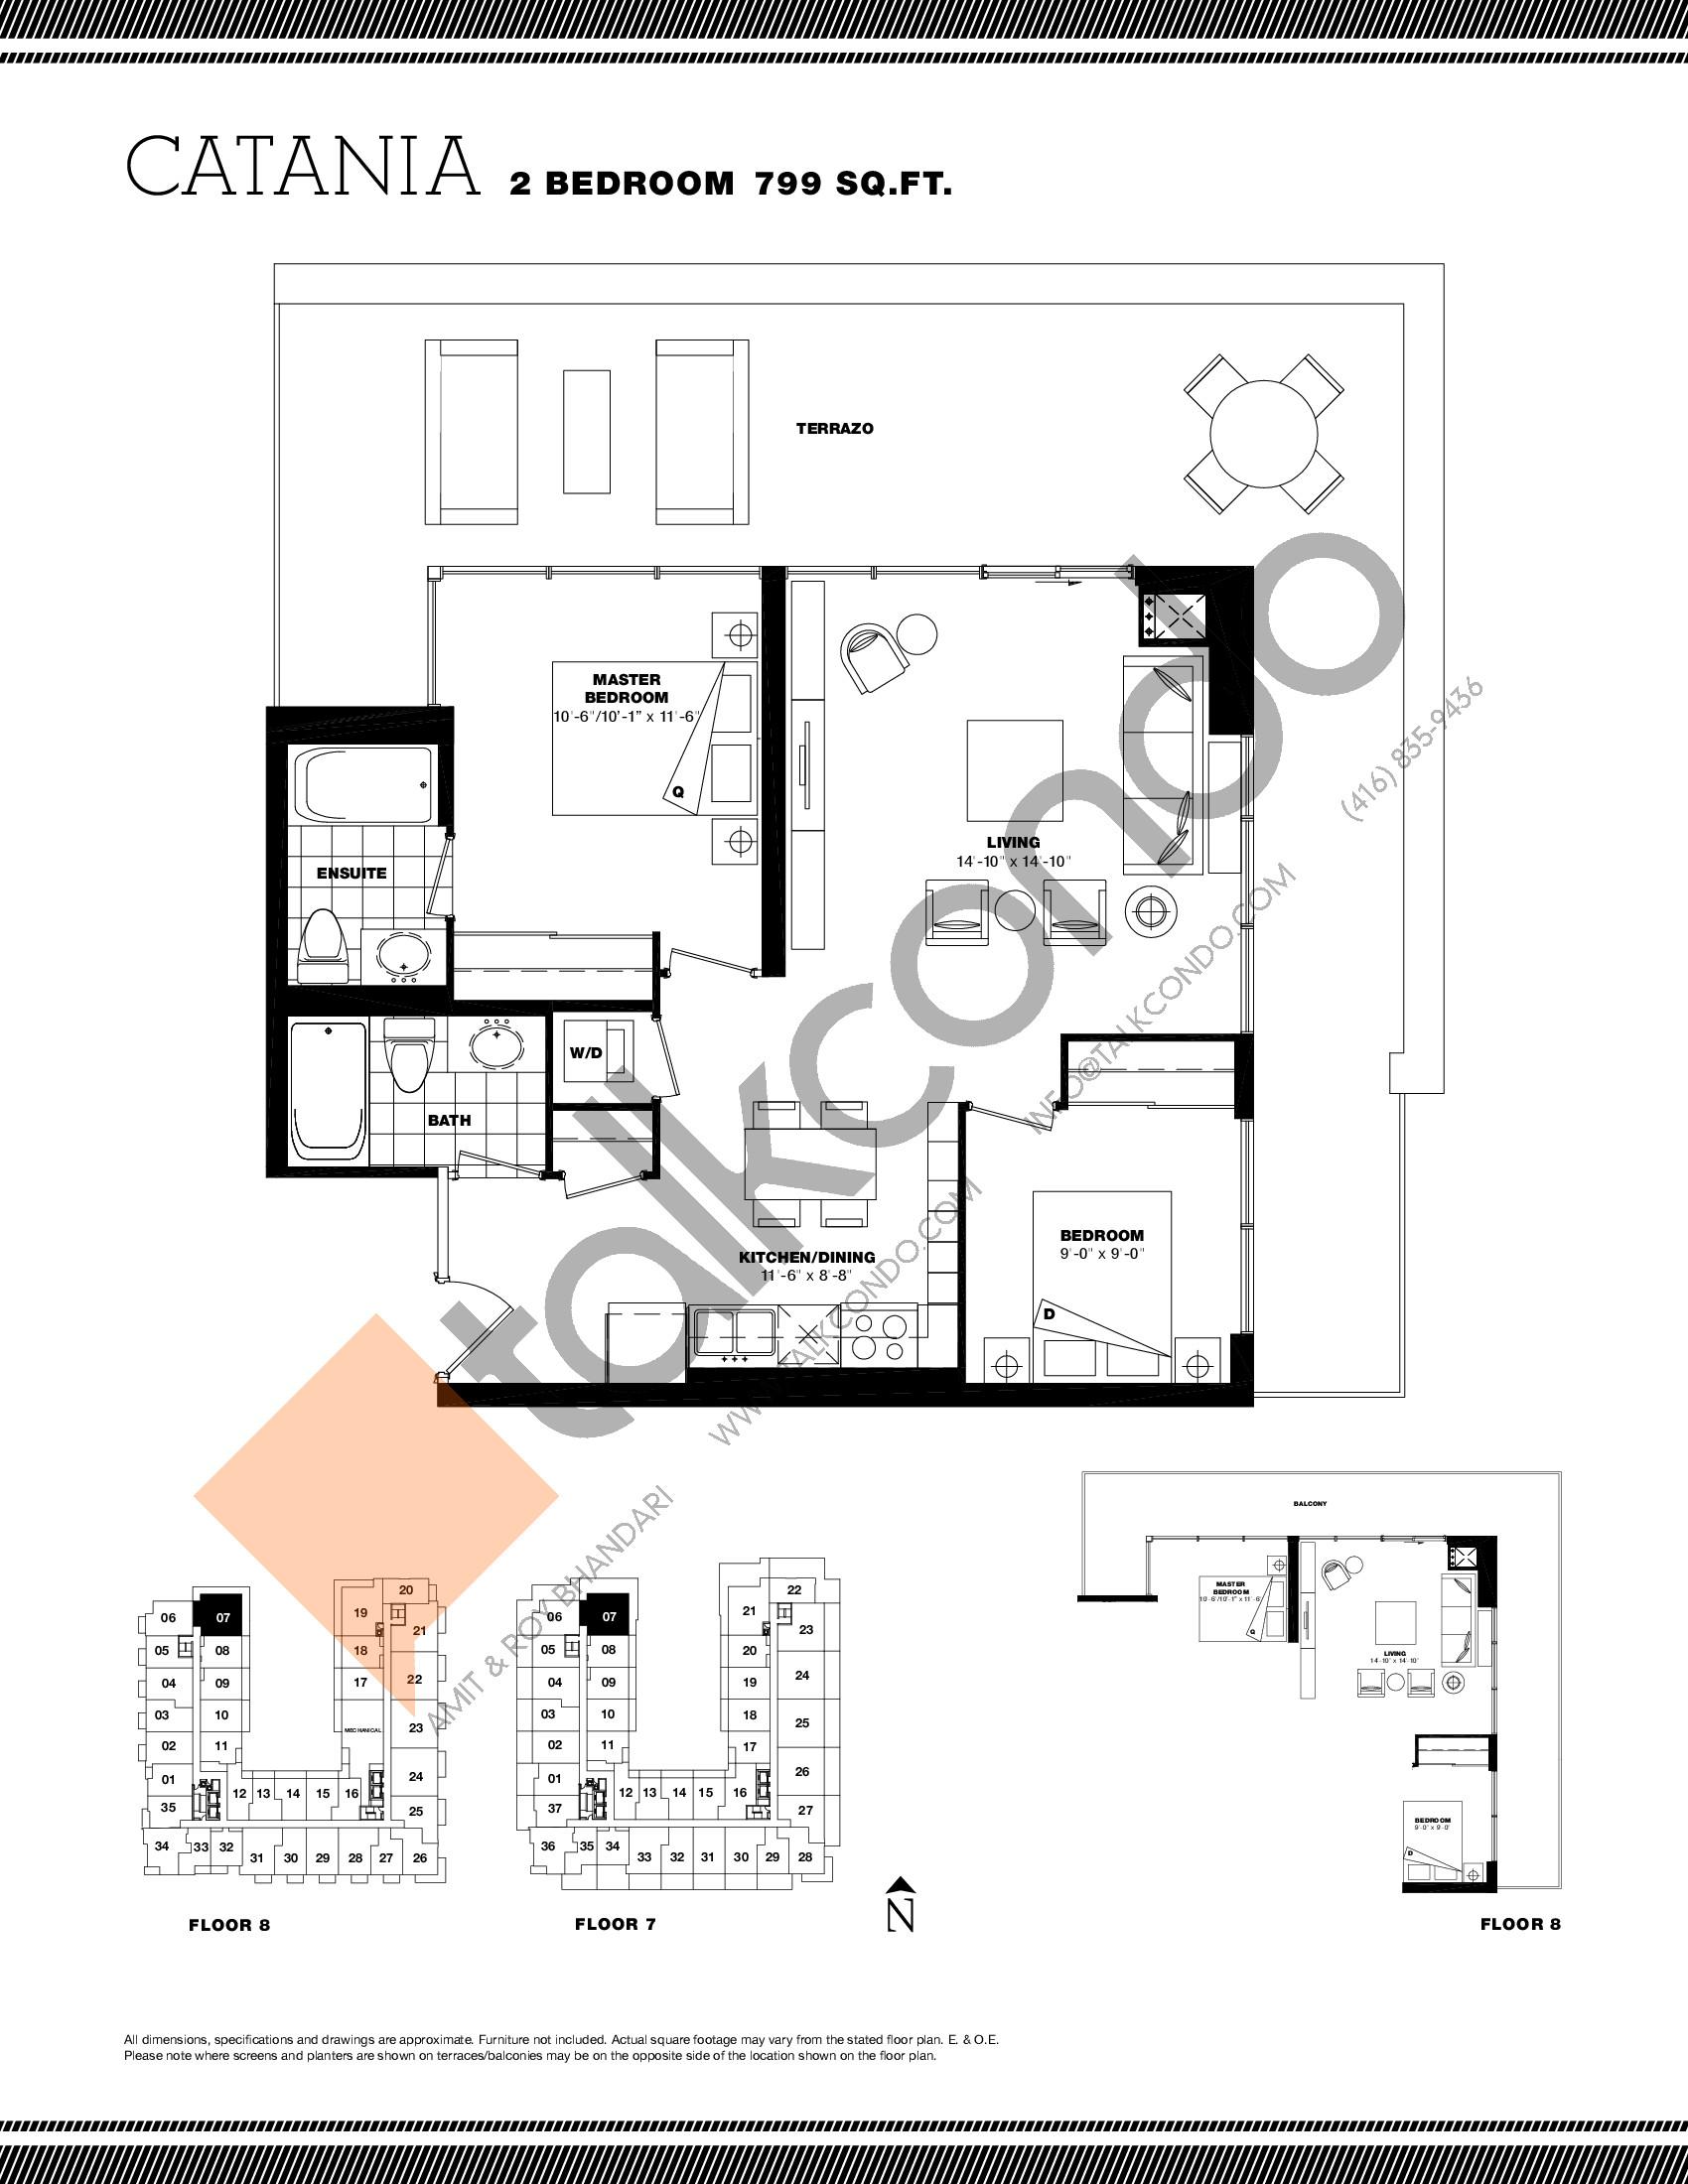 Catania Floor Plan at Residenze Palazzo at Treviso 3 Condos - 799 sq.ft